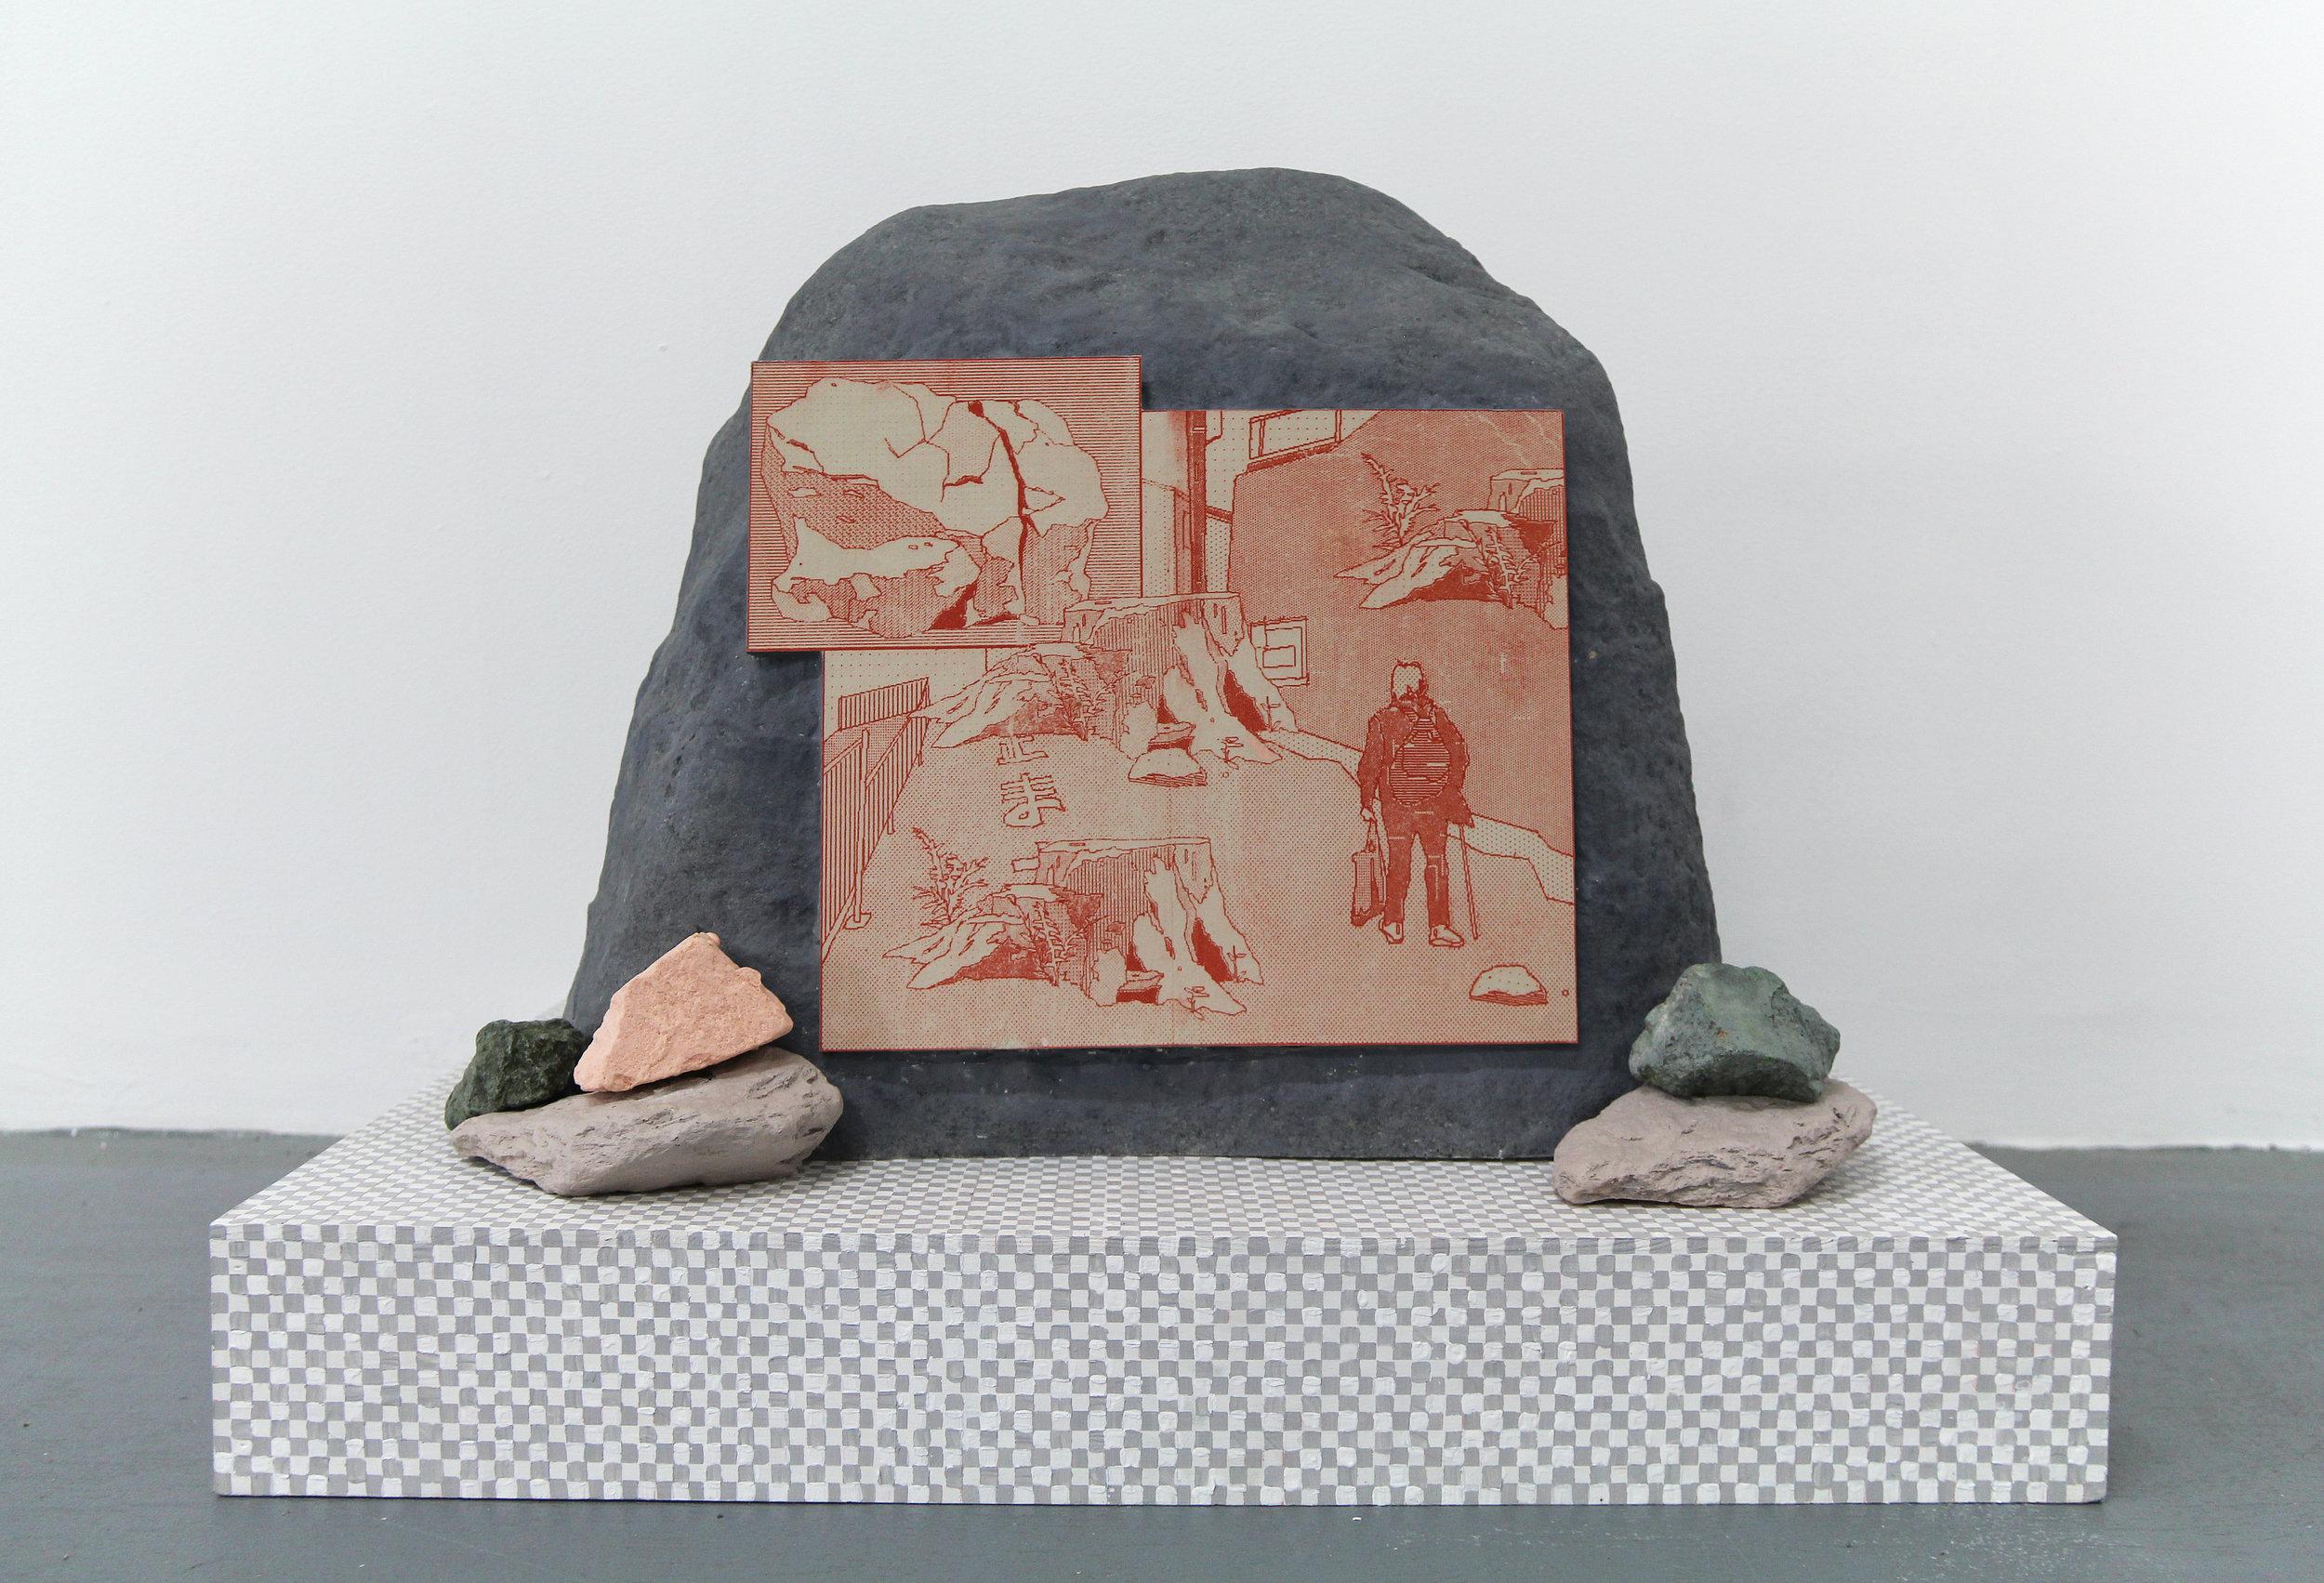 "Naomi Nakazato ""Swollen Feet"", 2018, polyurethane, lithograph mounted on MDF, acrylic on panel, 20 x 24 x 20 in."